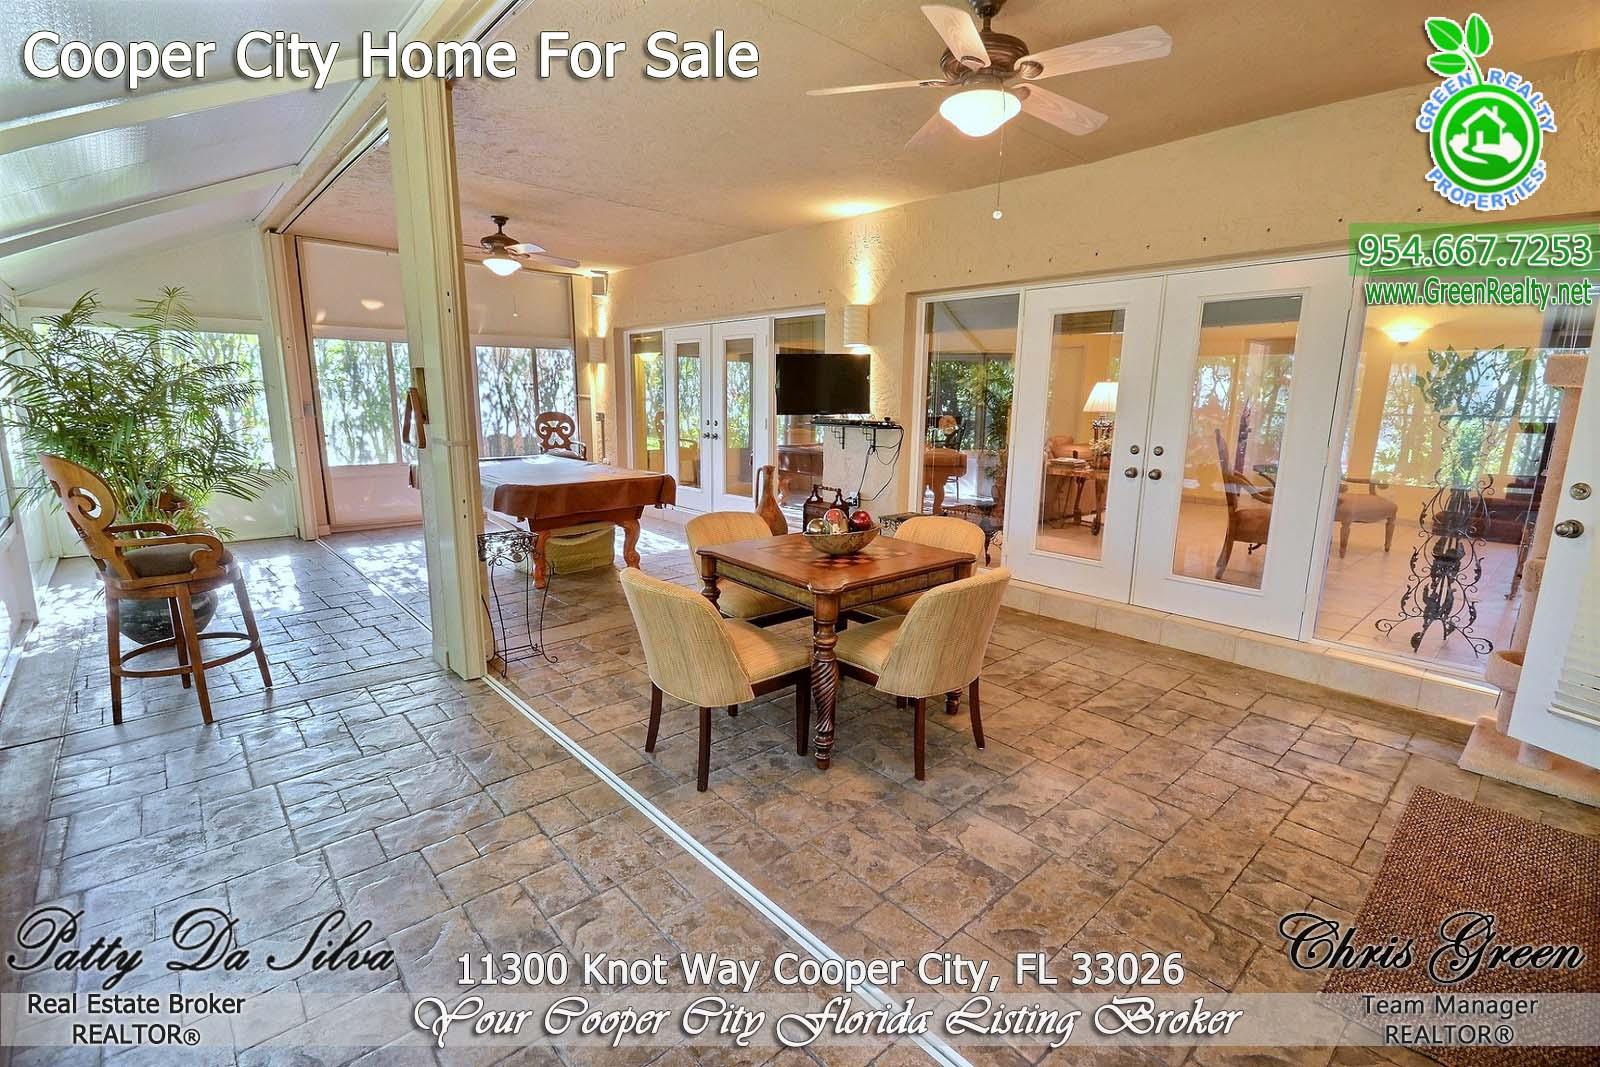 44 Rock Creek Cooper City Homes For Sale (2)